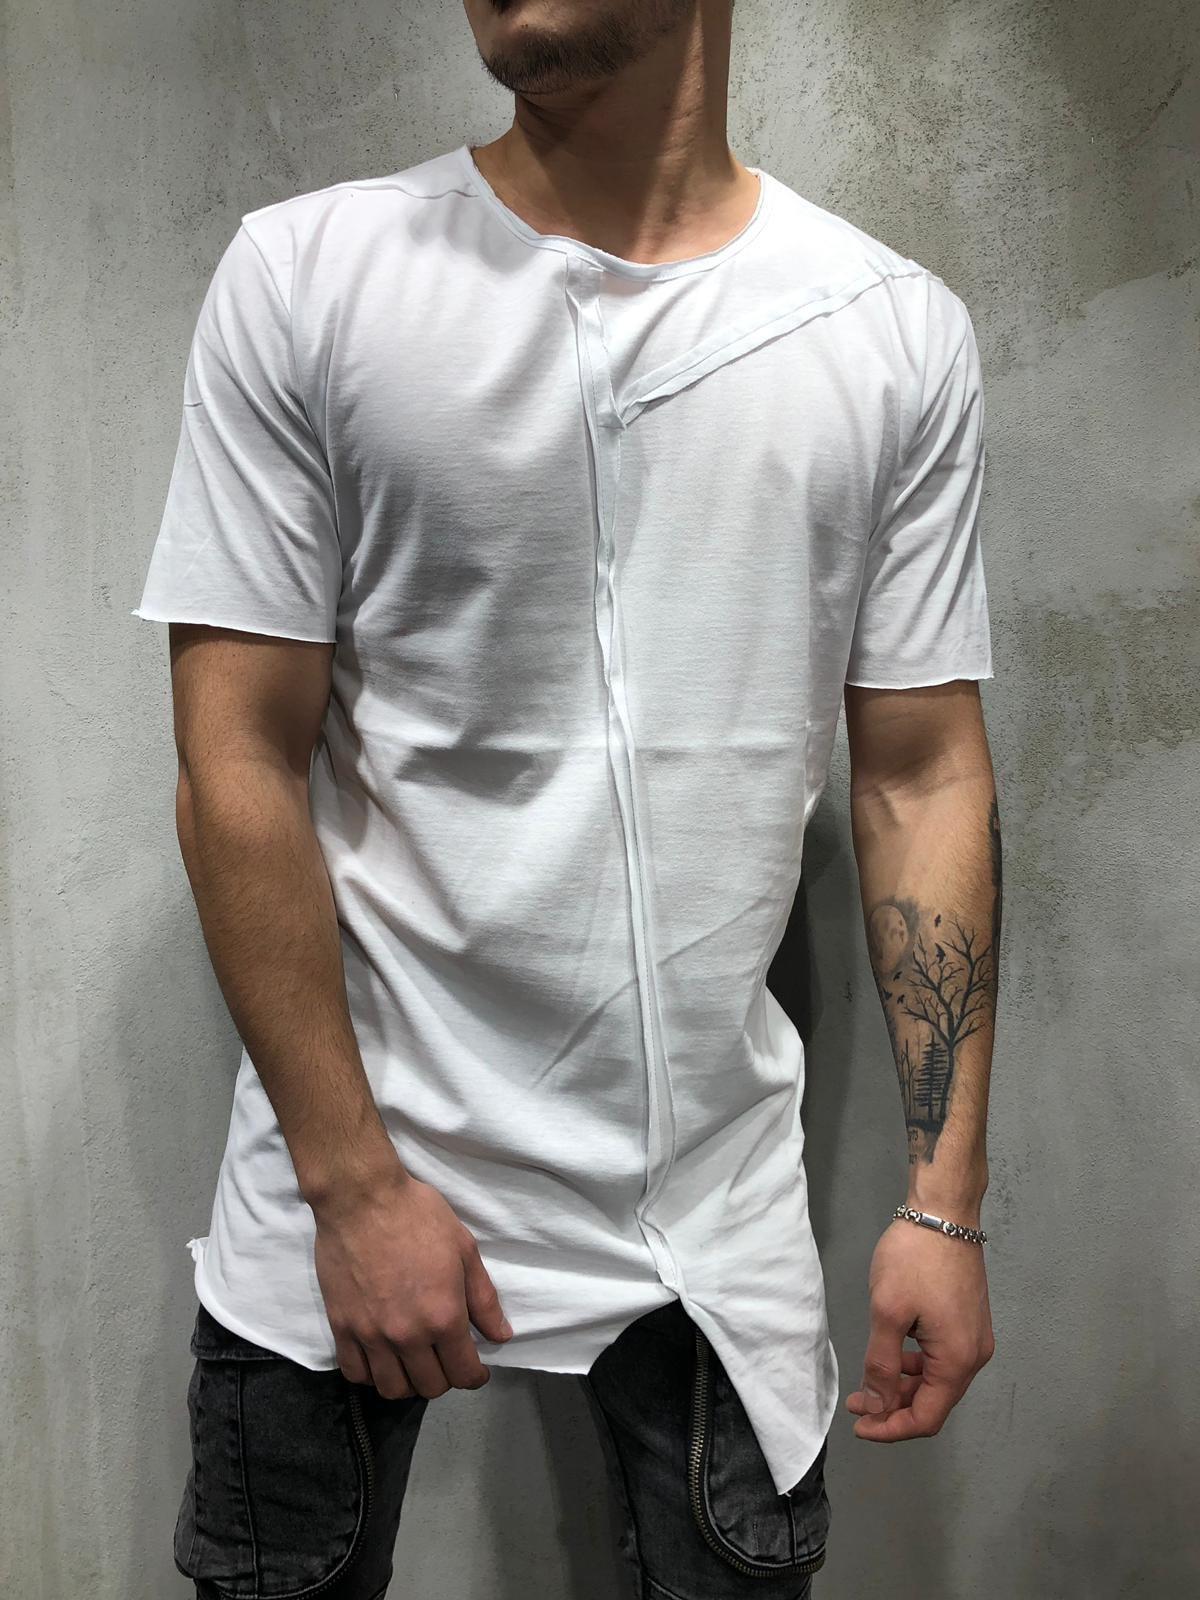 E-BAIHUI Men's Personality Streetwear T-shirt Summer Casual Stitching Hip Hop T-shirt Short-sleeve Round Neck T-shirt Male Q0807